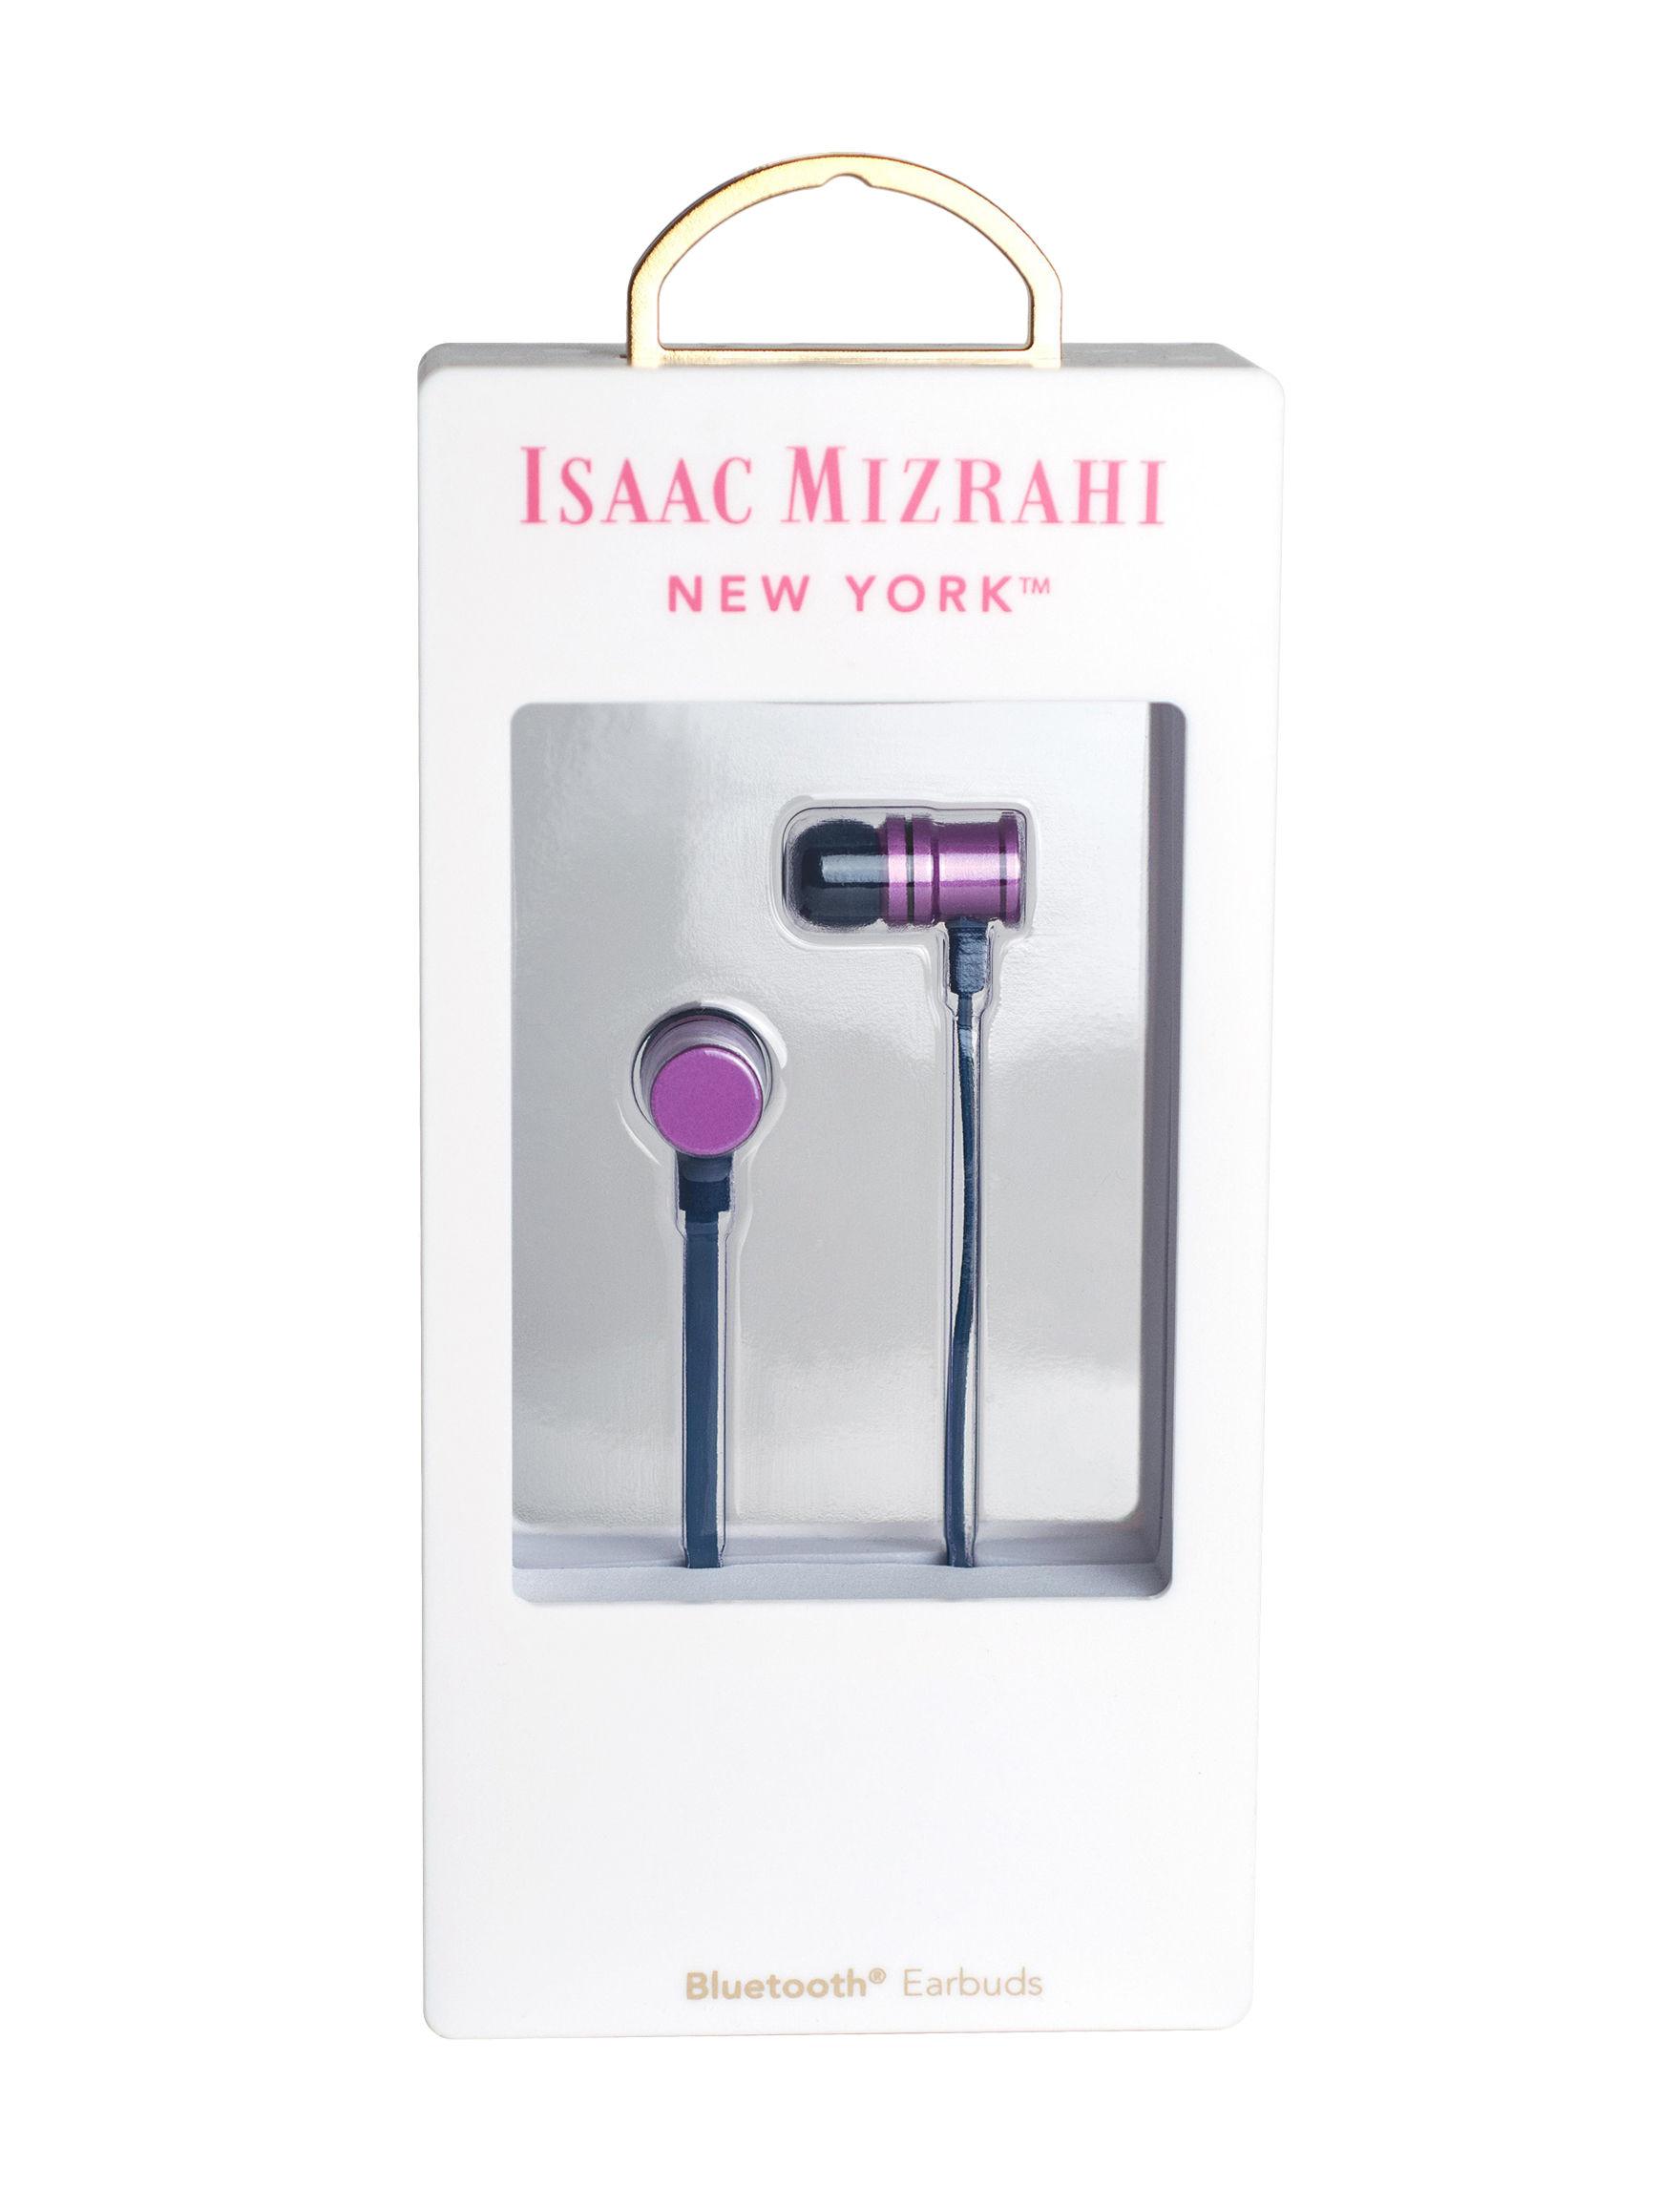 Isaac Mizrahi Purple Headphones Home & Portable Audio Tech Accessories